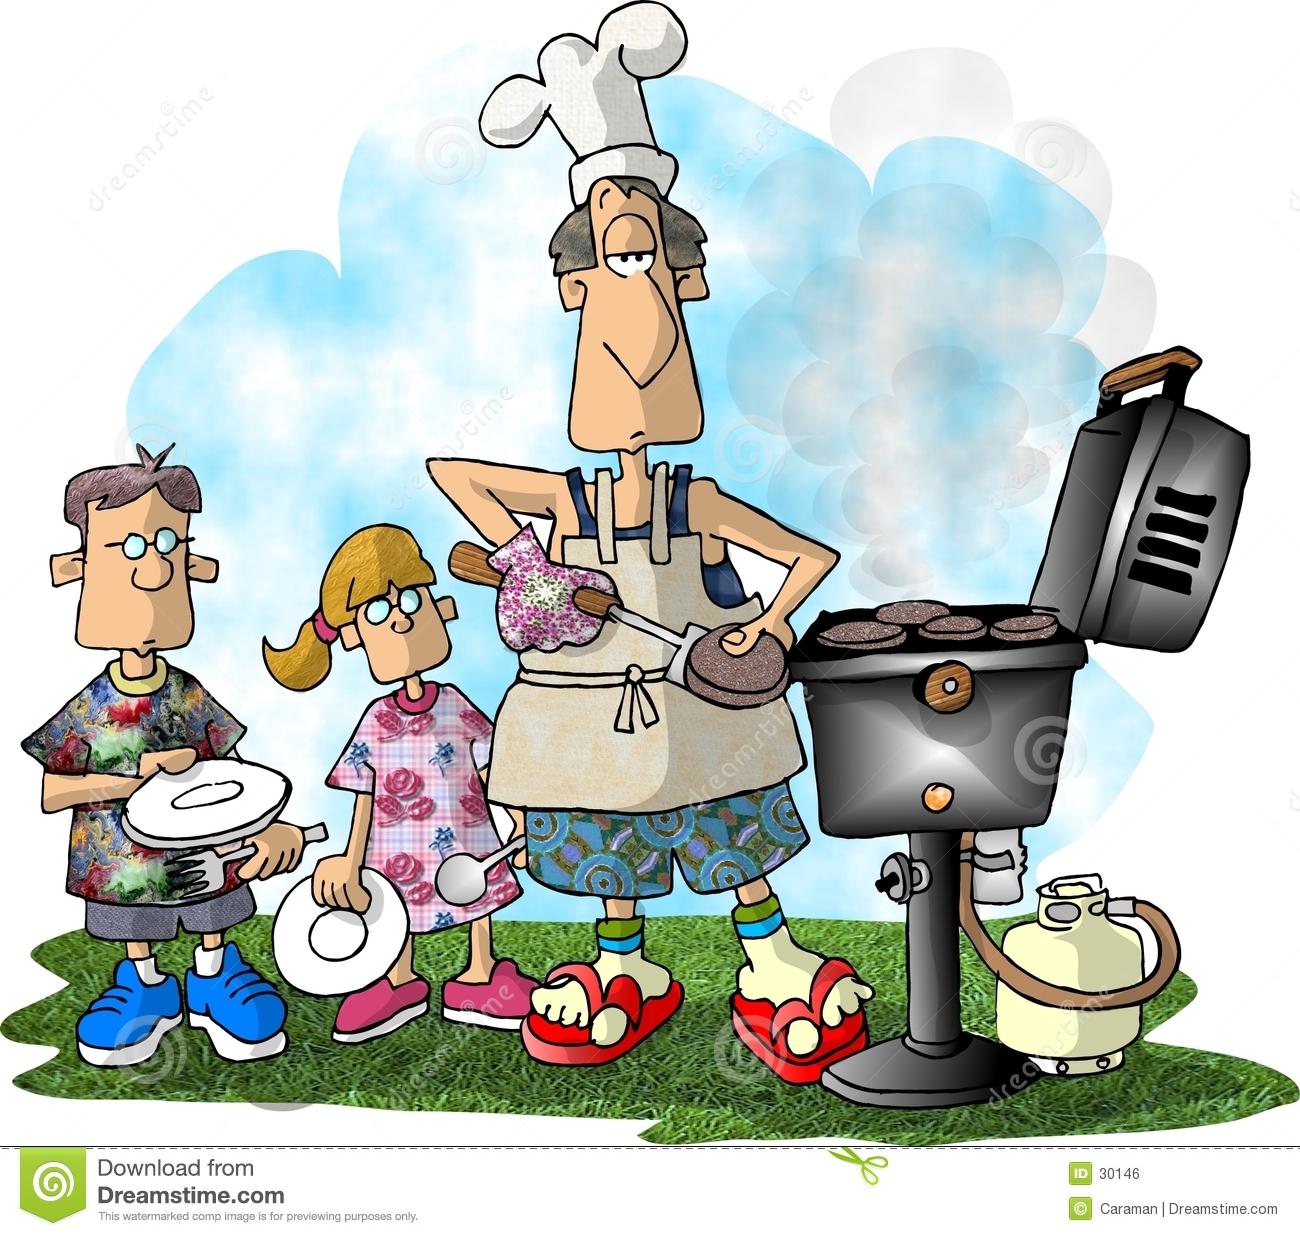 Barbecue clipart neighborhood party, Barbecue neighborhood.